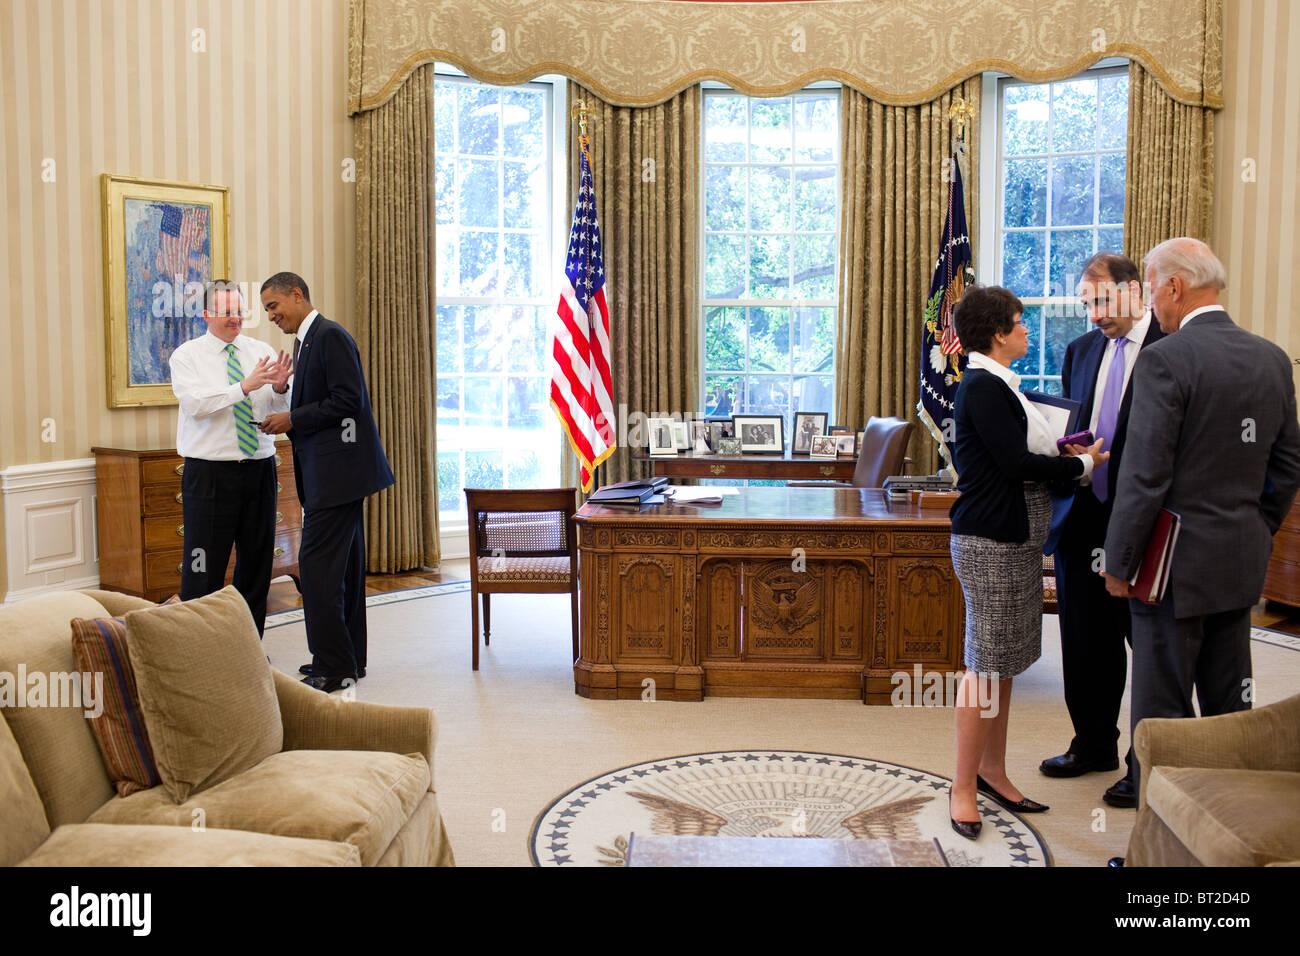 president obama talks with press secretary robert gibbs in the oval office stock image barack obama enters oval